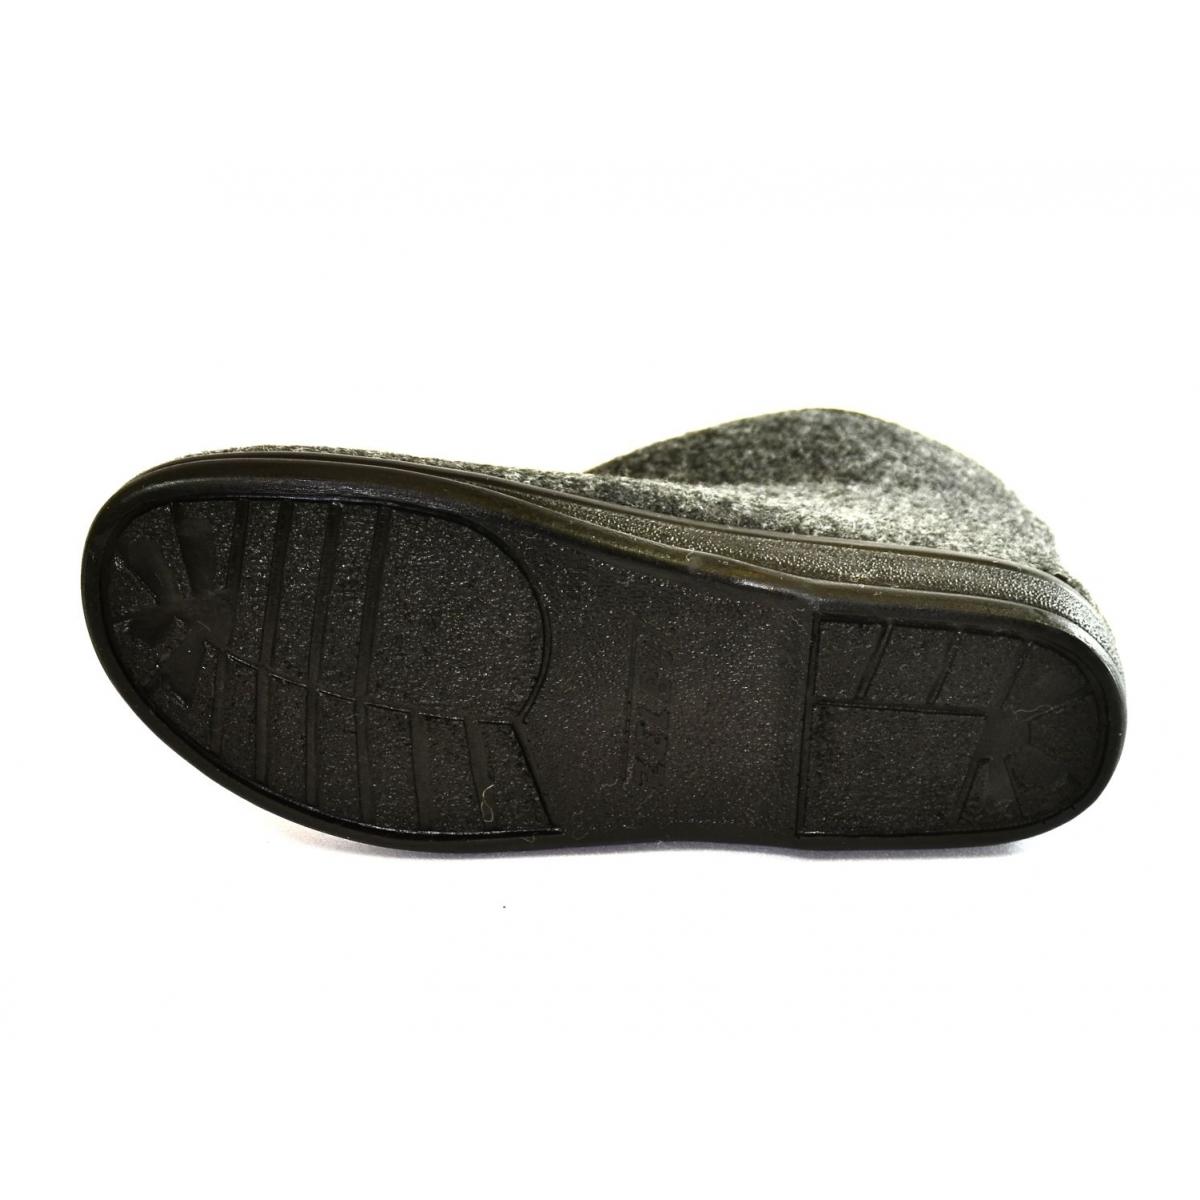 7bd62eb4ad9c Pánske sivé papuče PIXO - 4